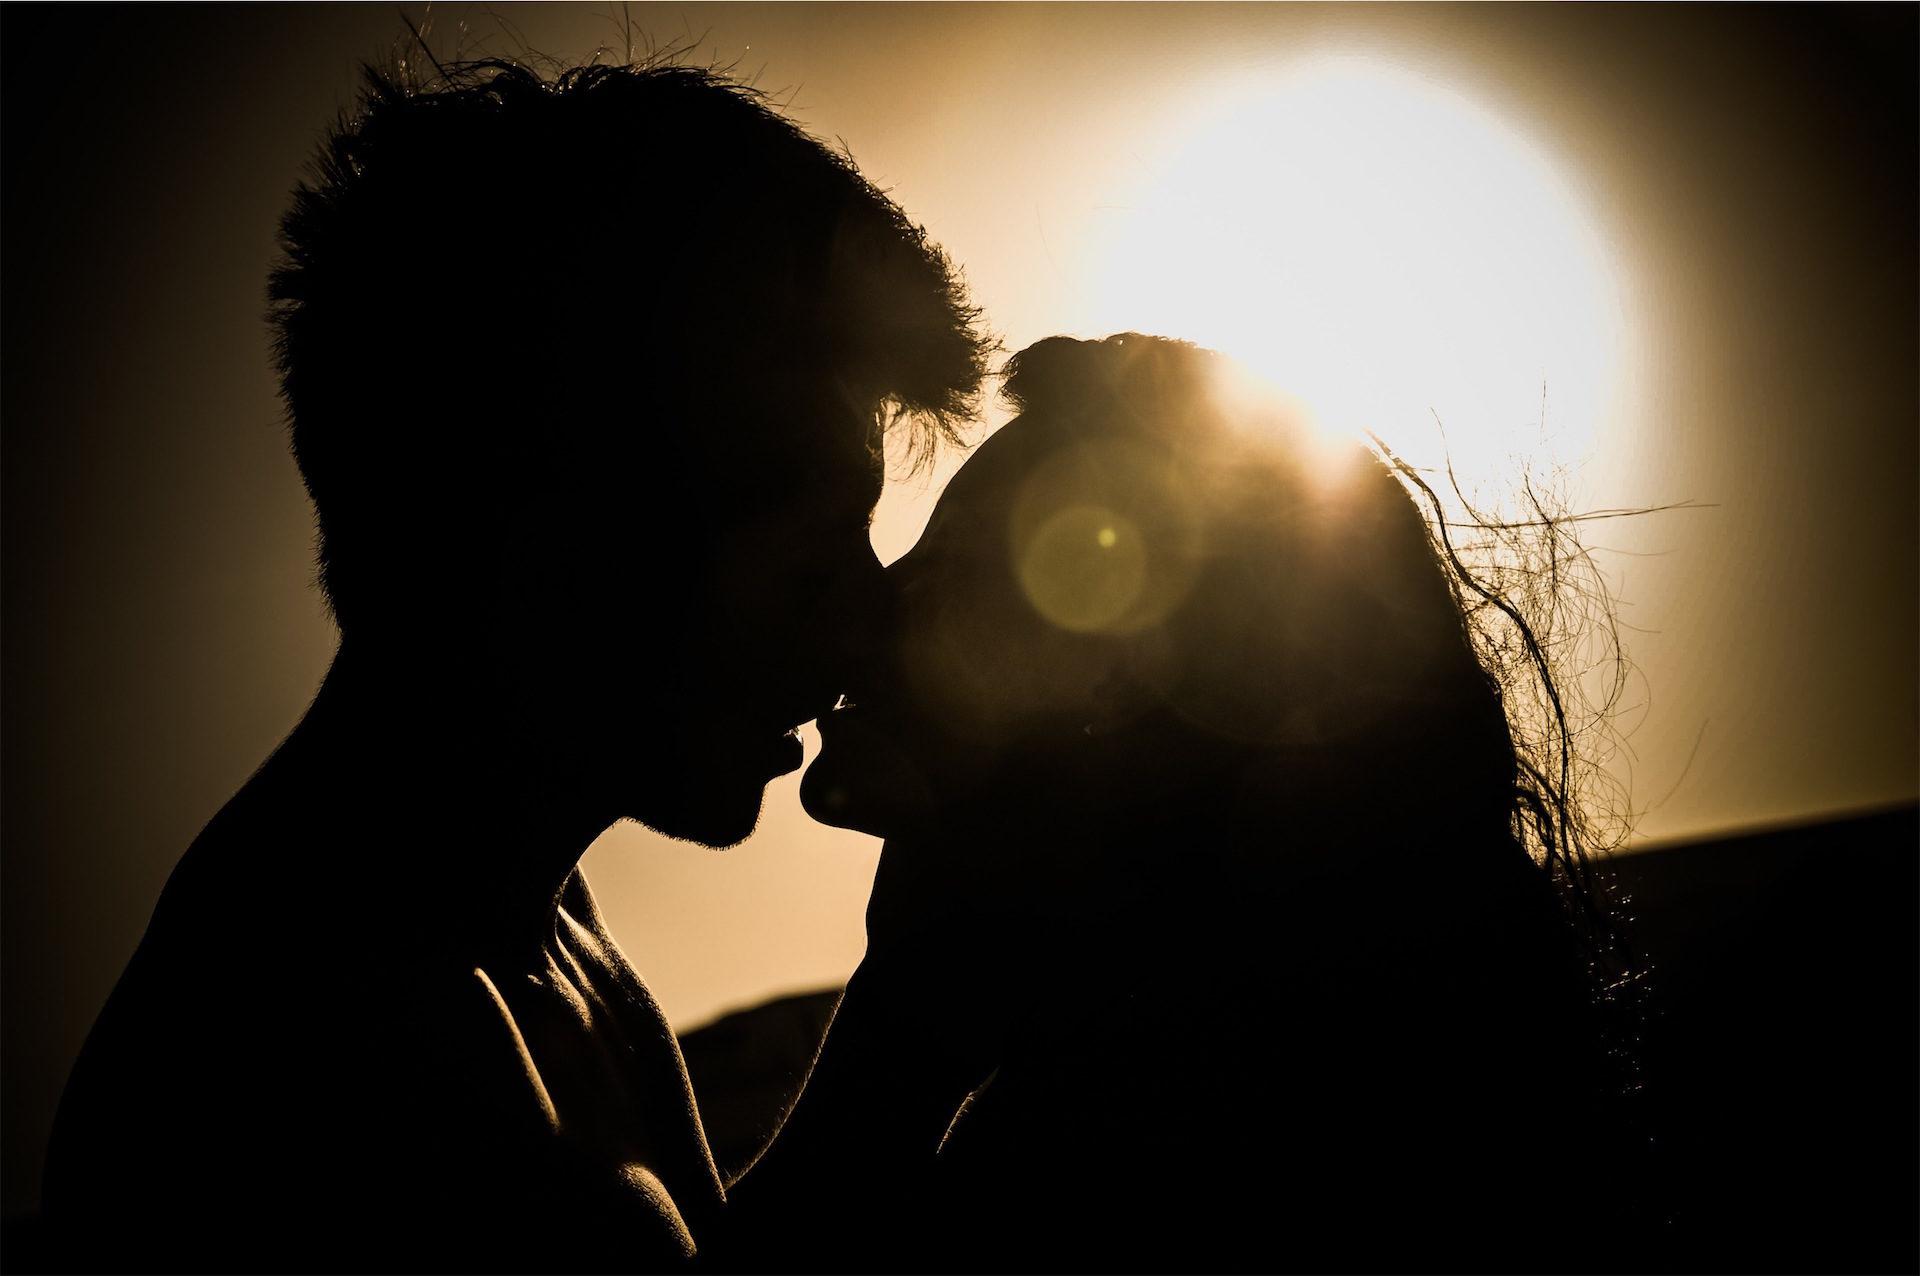 casal, sombras, amor, paixão, Sol - Papéis de parede HD - Professor-falken.com